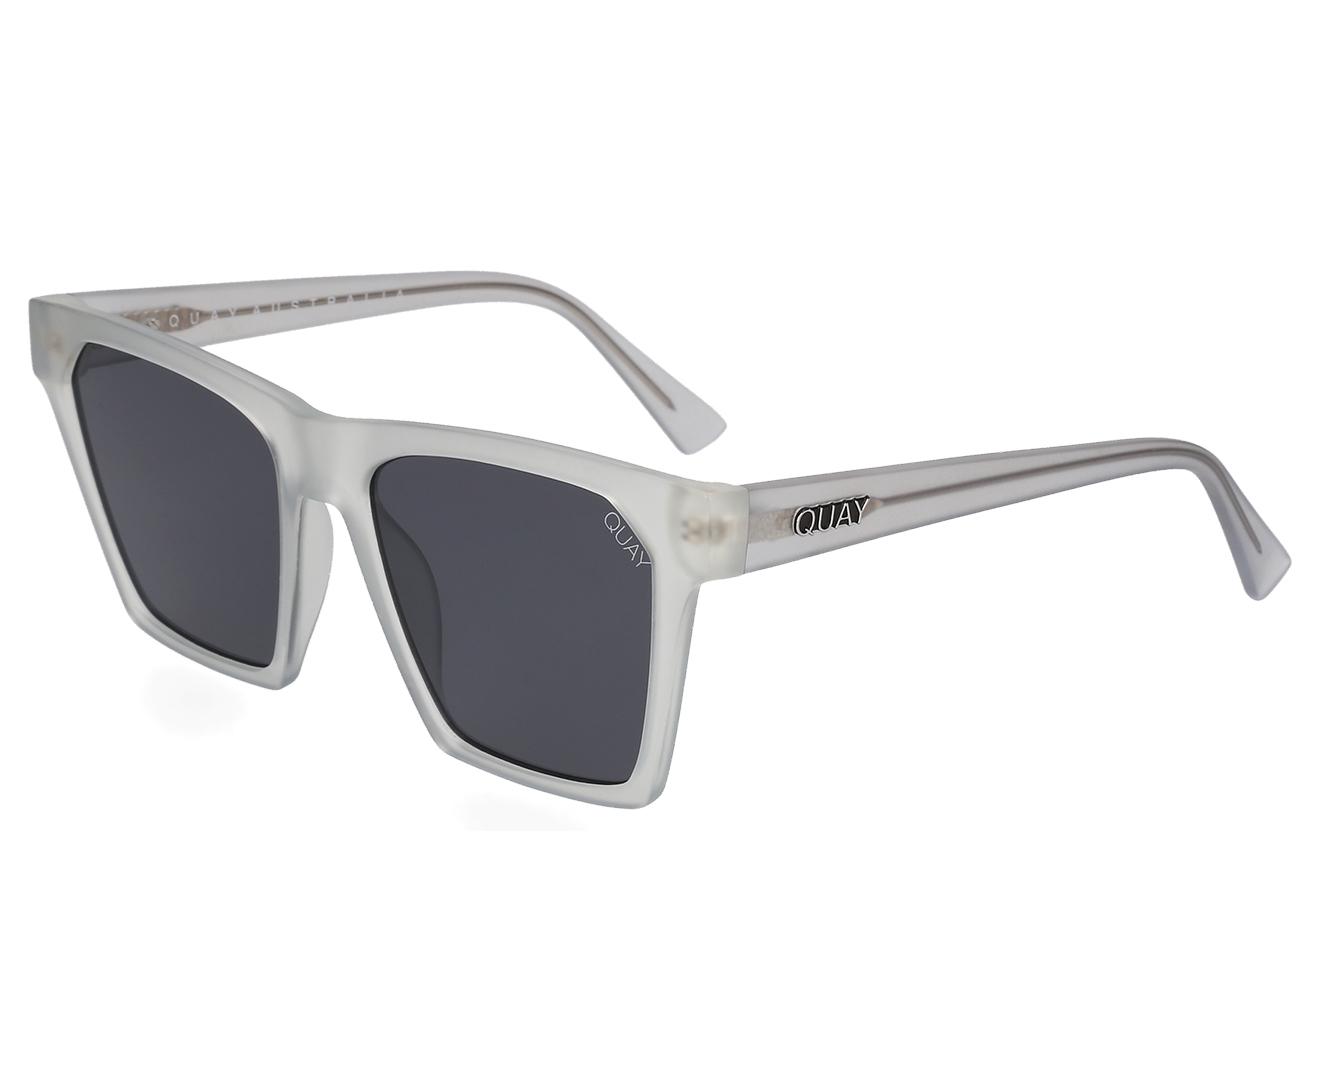 41fab96025 Quay Australia Women s Alright-A Sunglasses - White Smoke